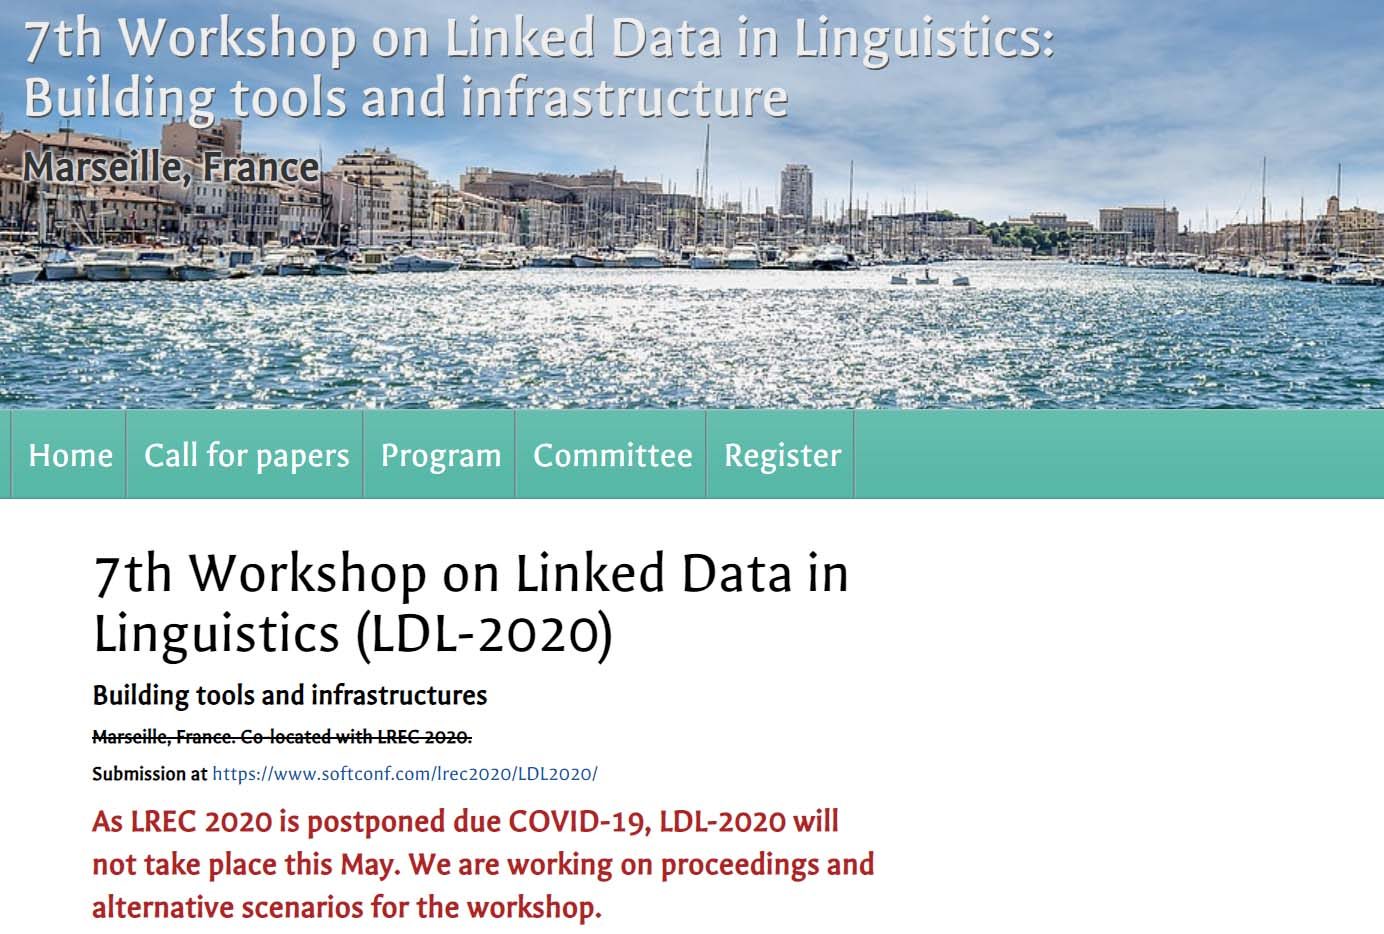 7th Workshop on Linked Data in Linguistics (LDL-2020)